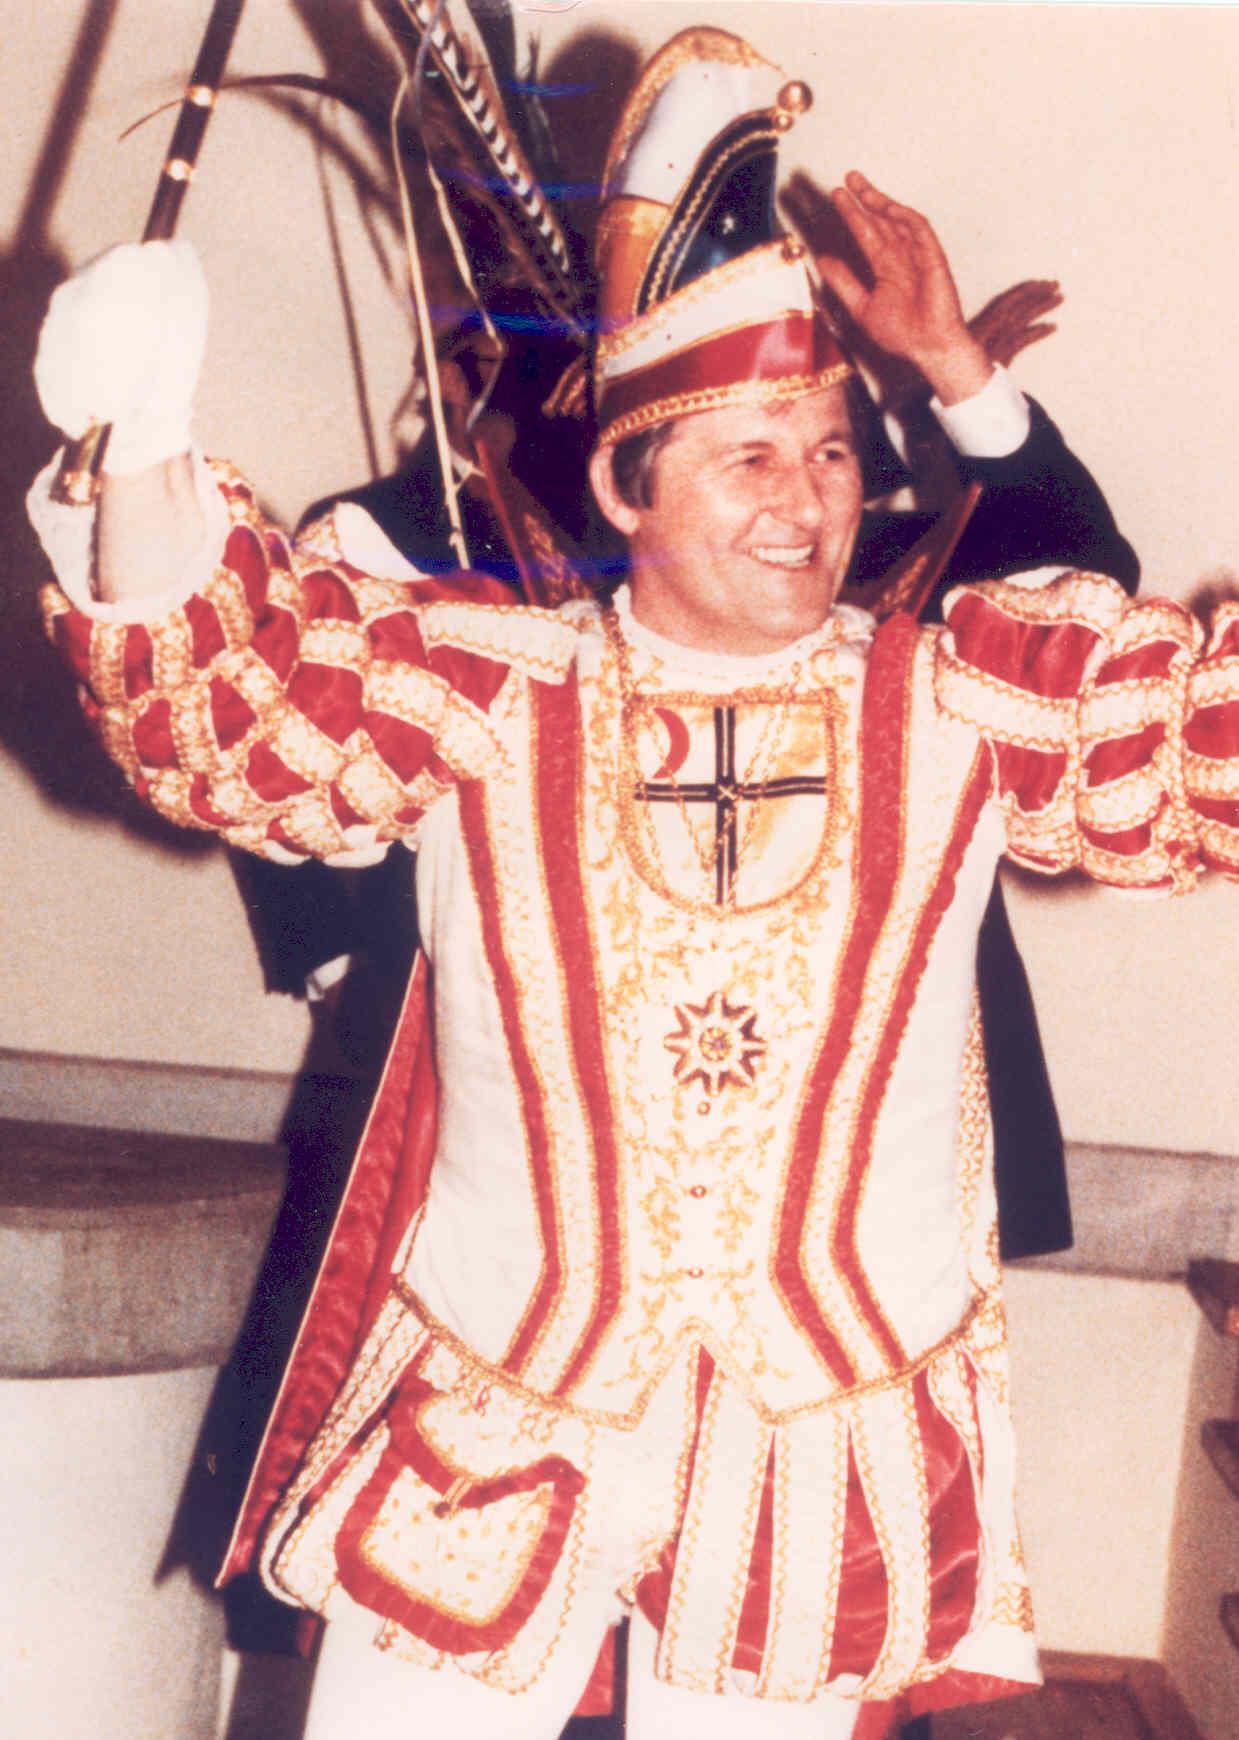 1978-Josef I (Platte)